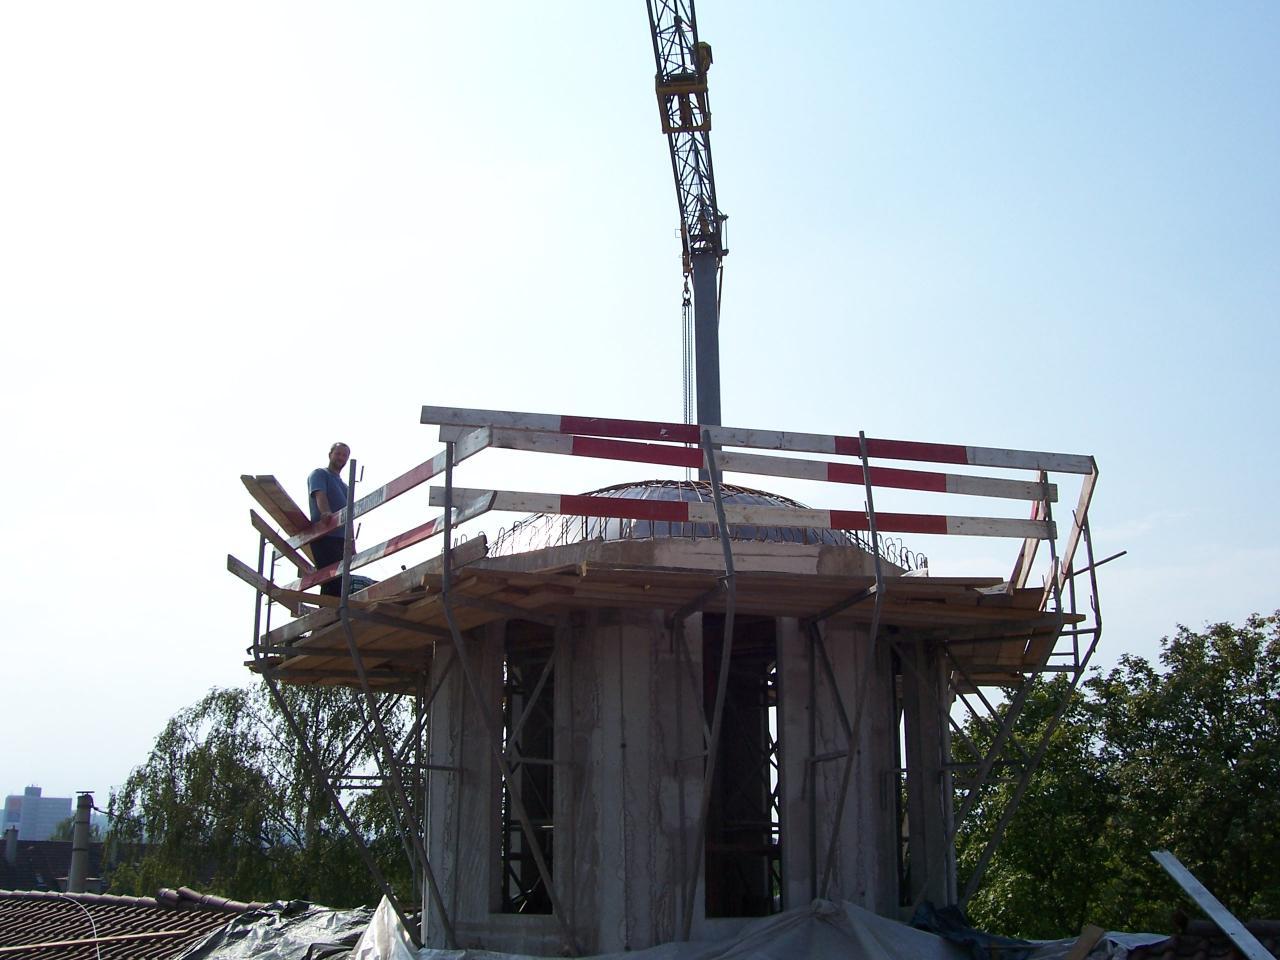 Septembrie, 1 - Turnul si cupola